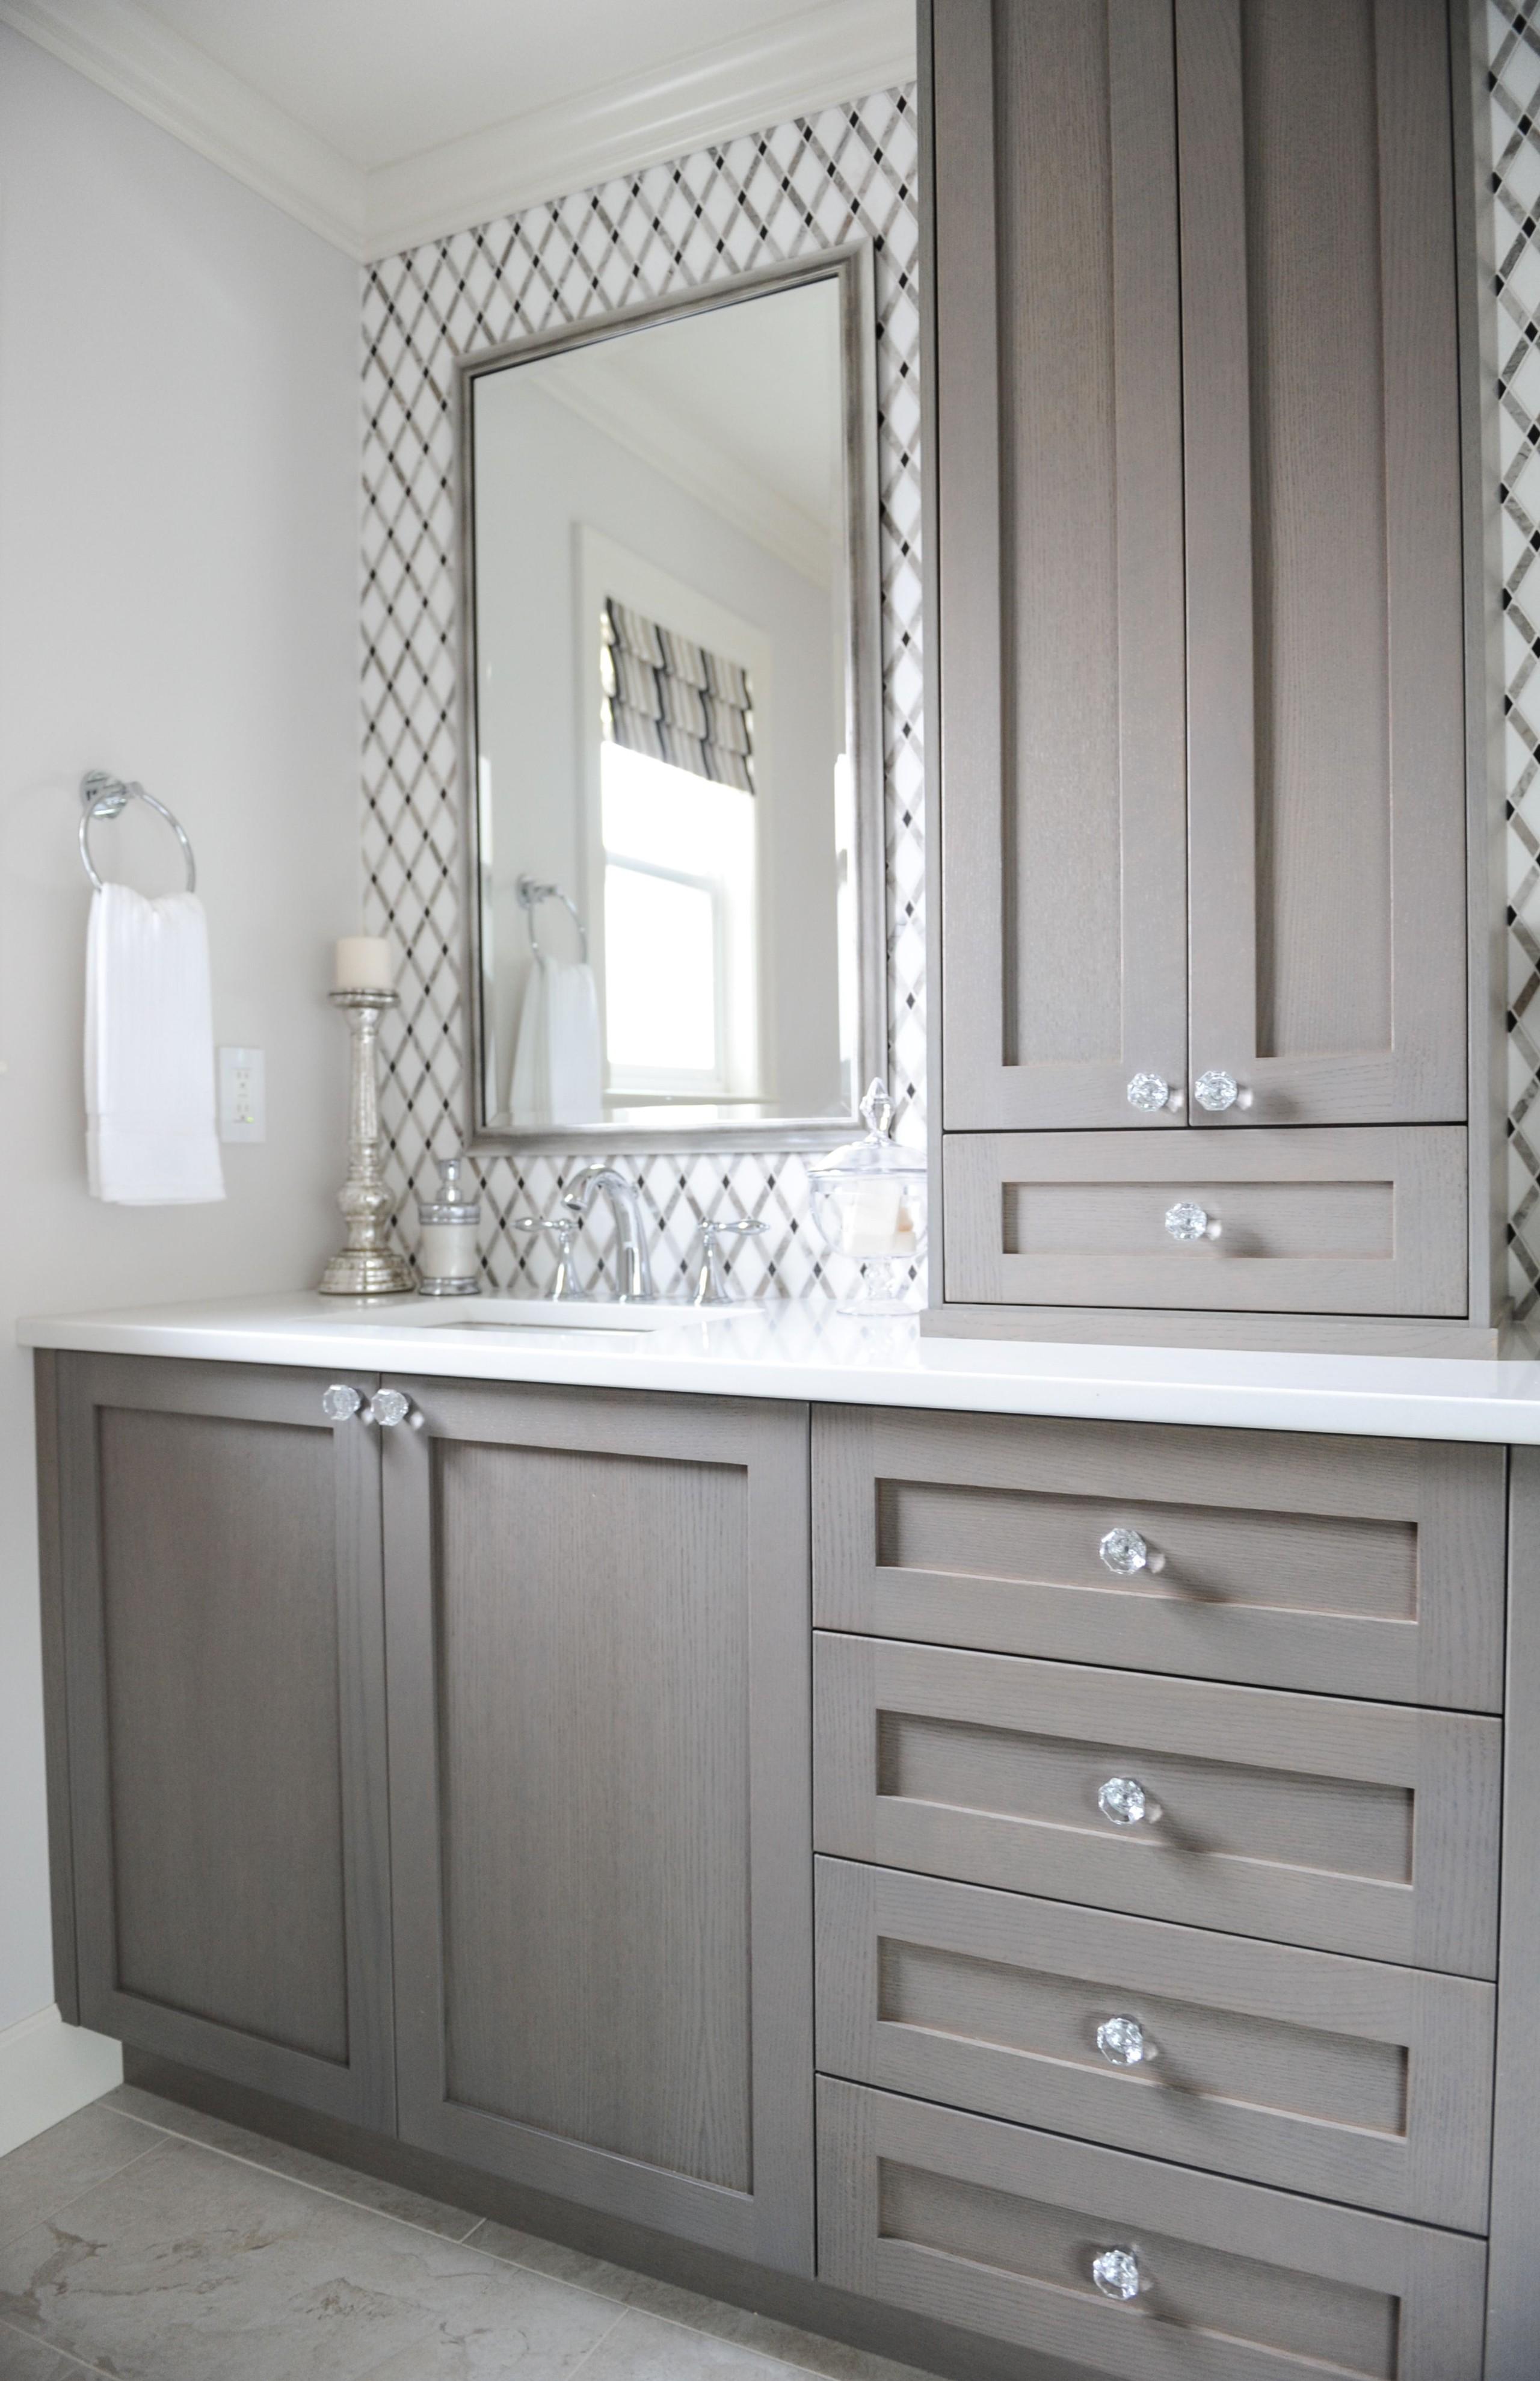 Bathroom Linen Tower  Foter